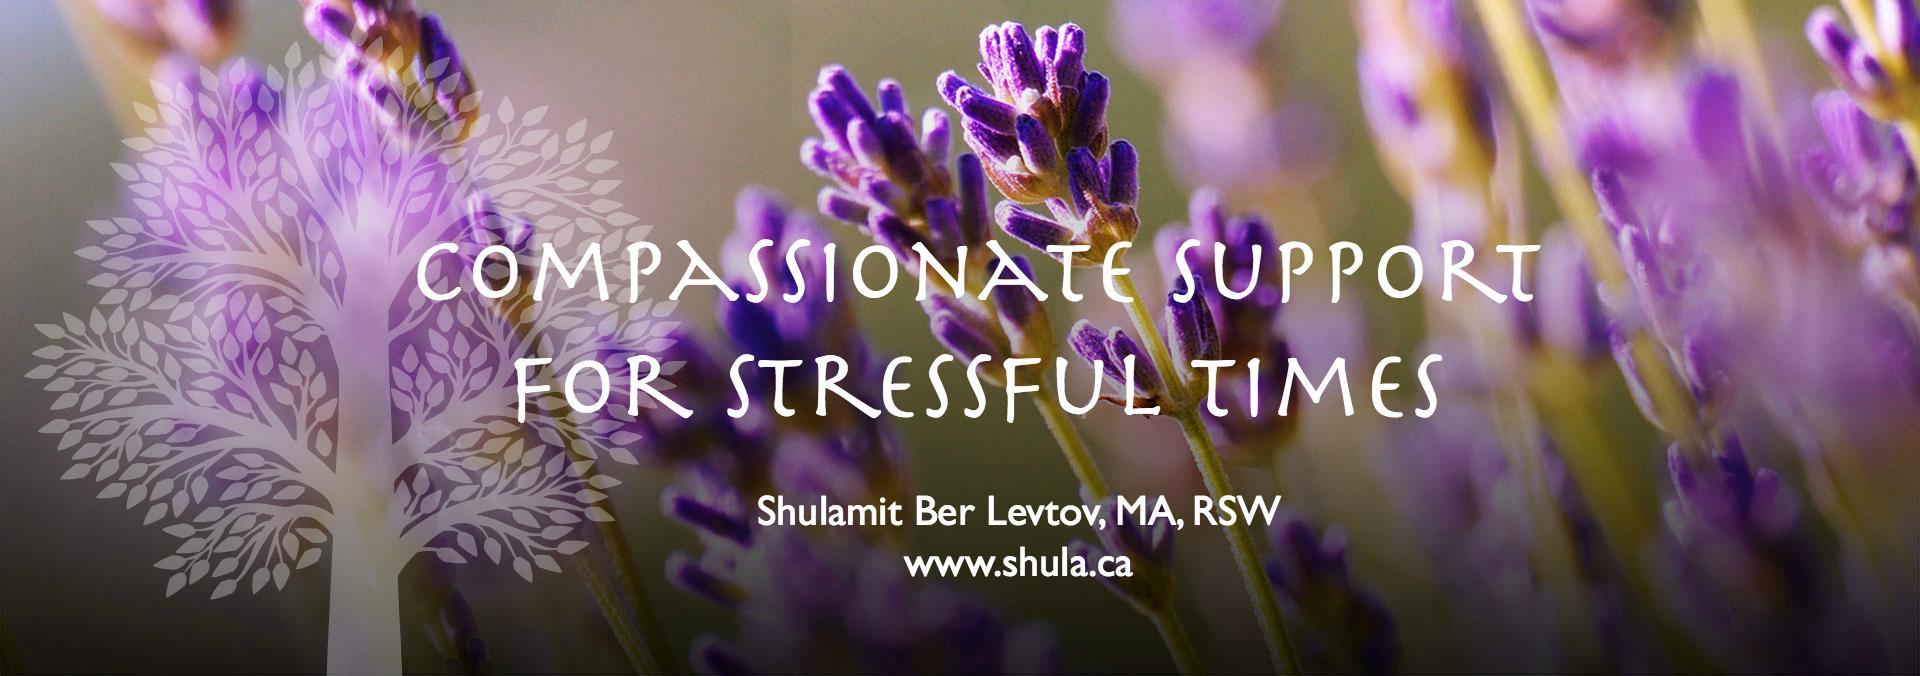 The healing power of essential oils - Shulamit Berlevtov